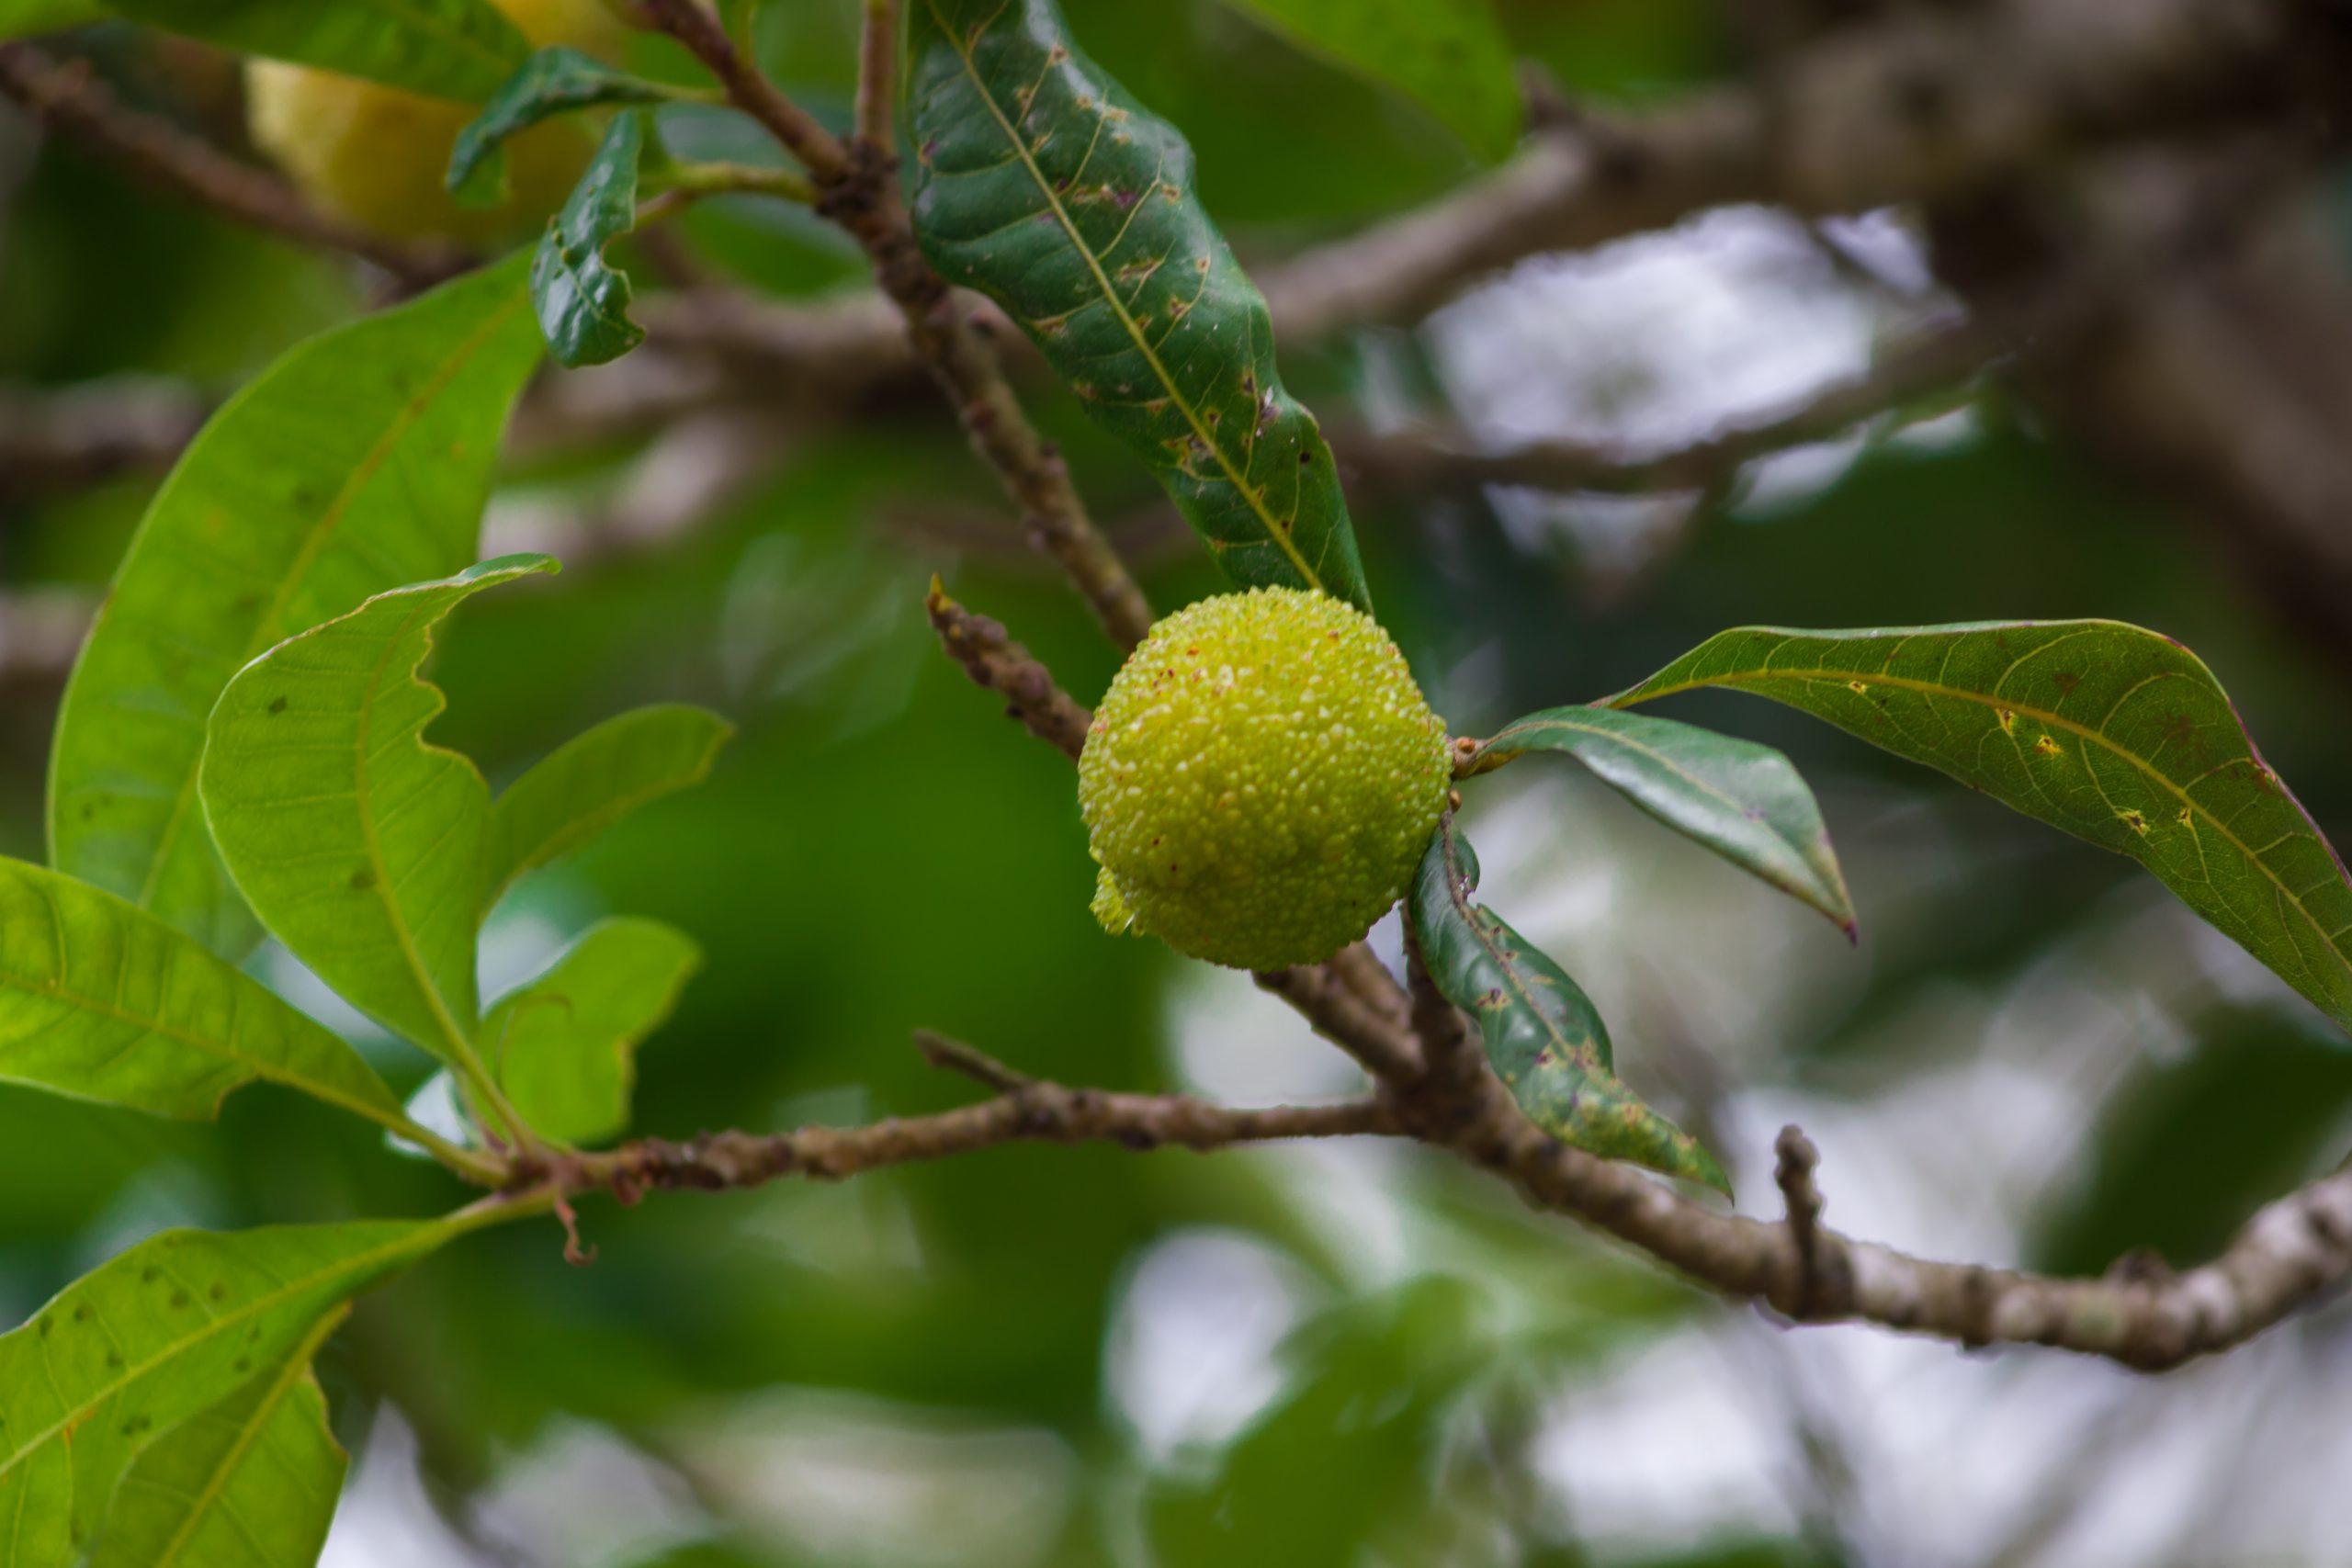 A green berry